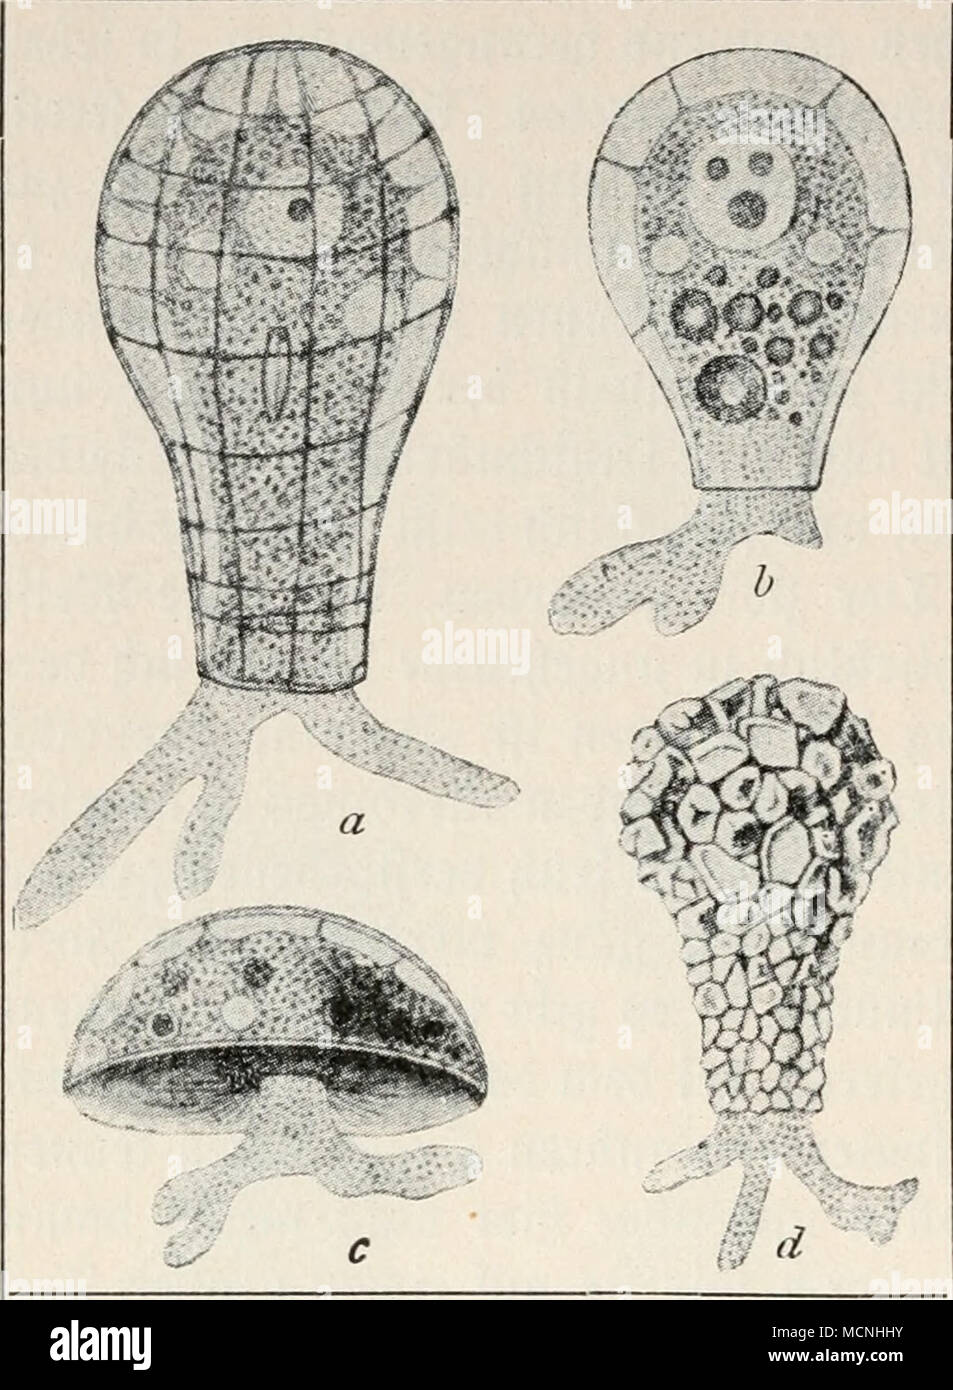 Beste Hai Muskelanatomie Bilder - Anatomie Ideen - finotti.info